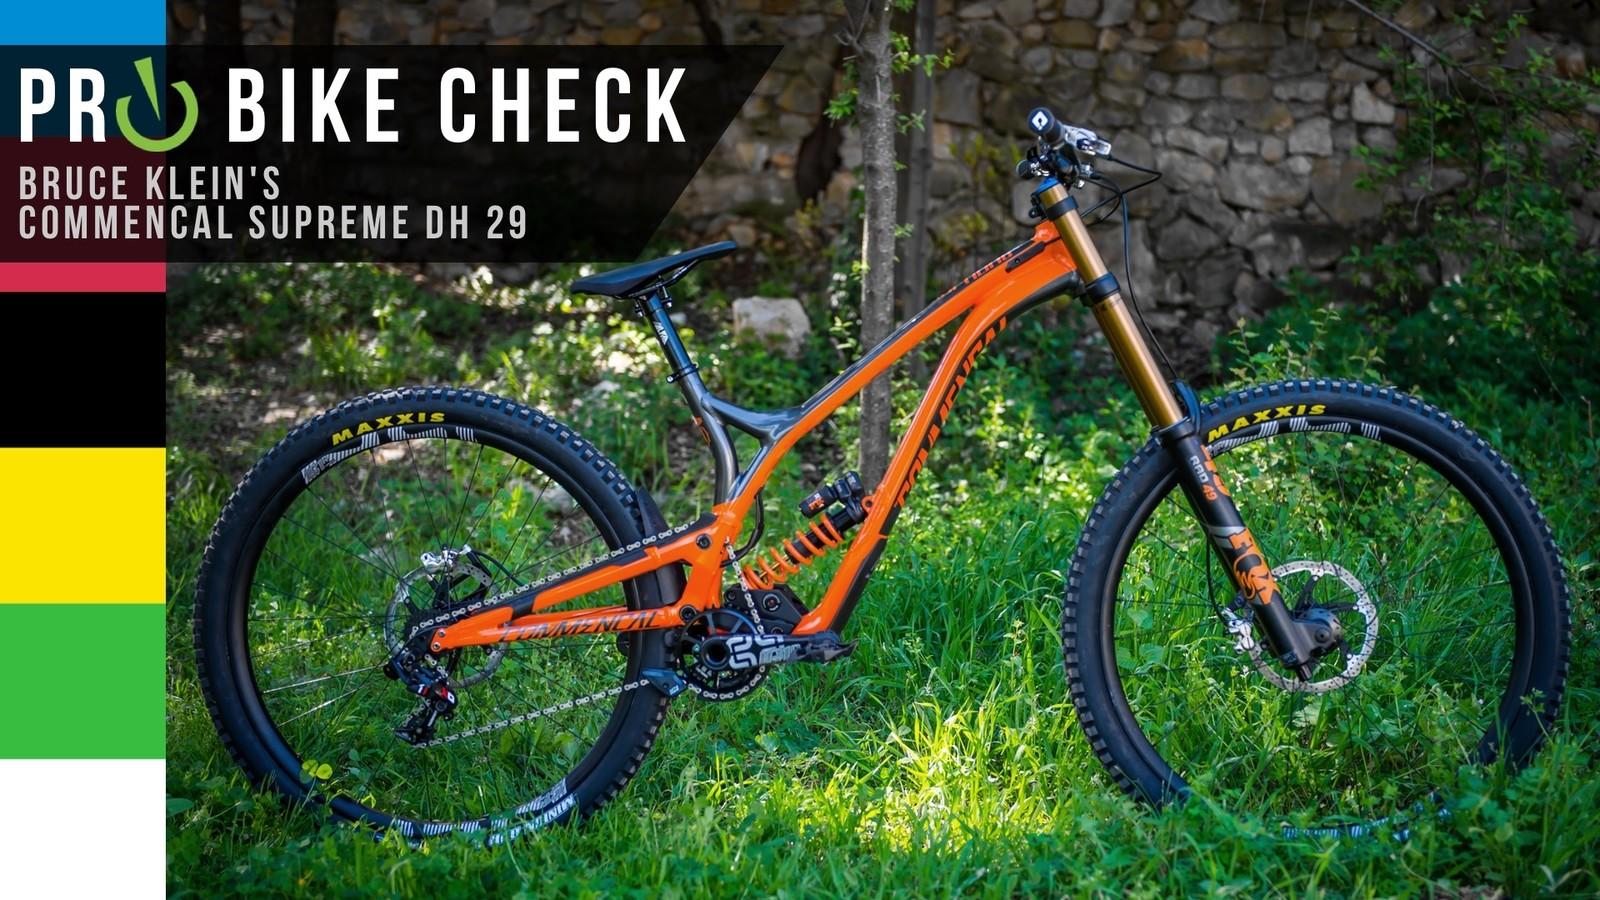 Pro Bike Check: Bruce Klein's Commencal Supreme DH 29